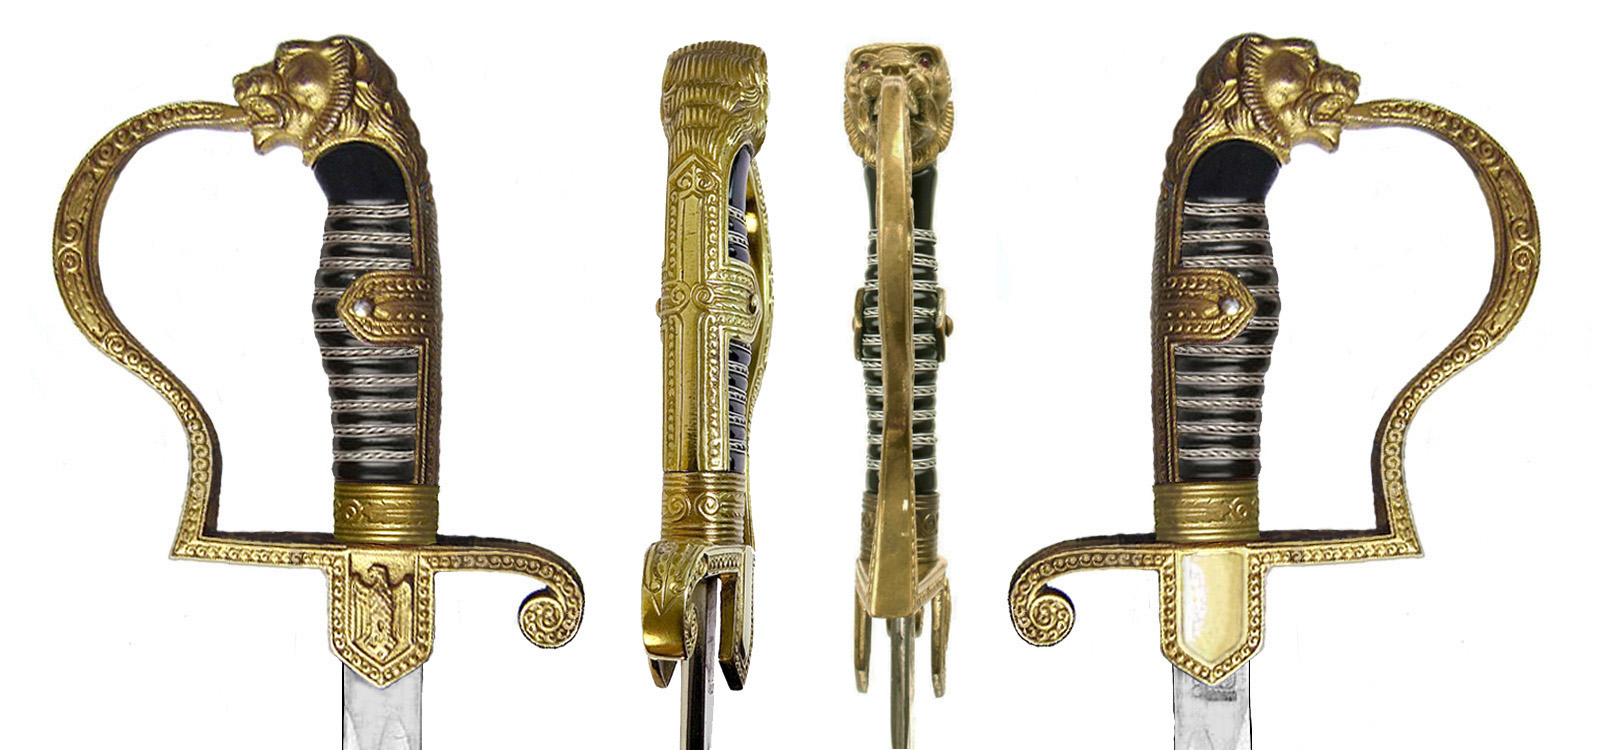 Eickhorn field marshall swords identification guide